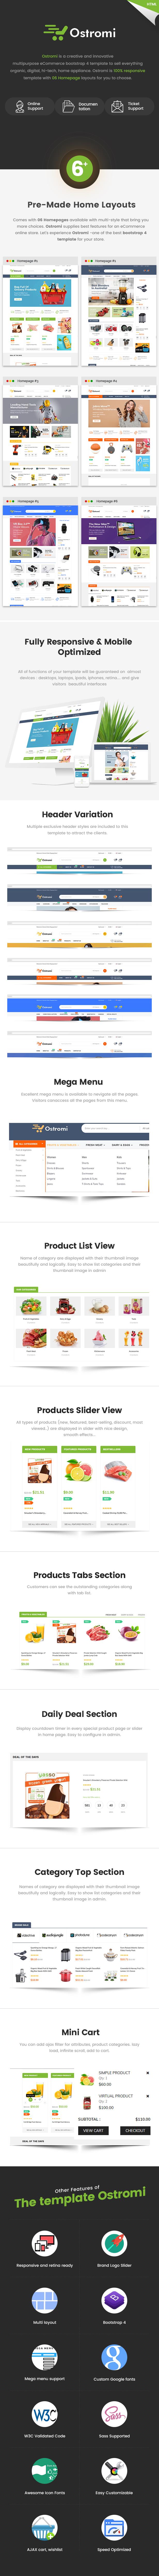 Ostromi – Organic Electronics Shop HTML Template, Gobase64